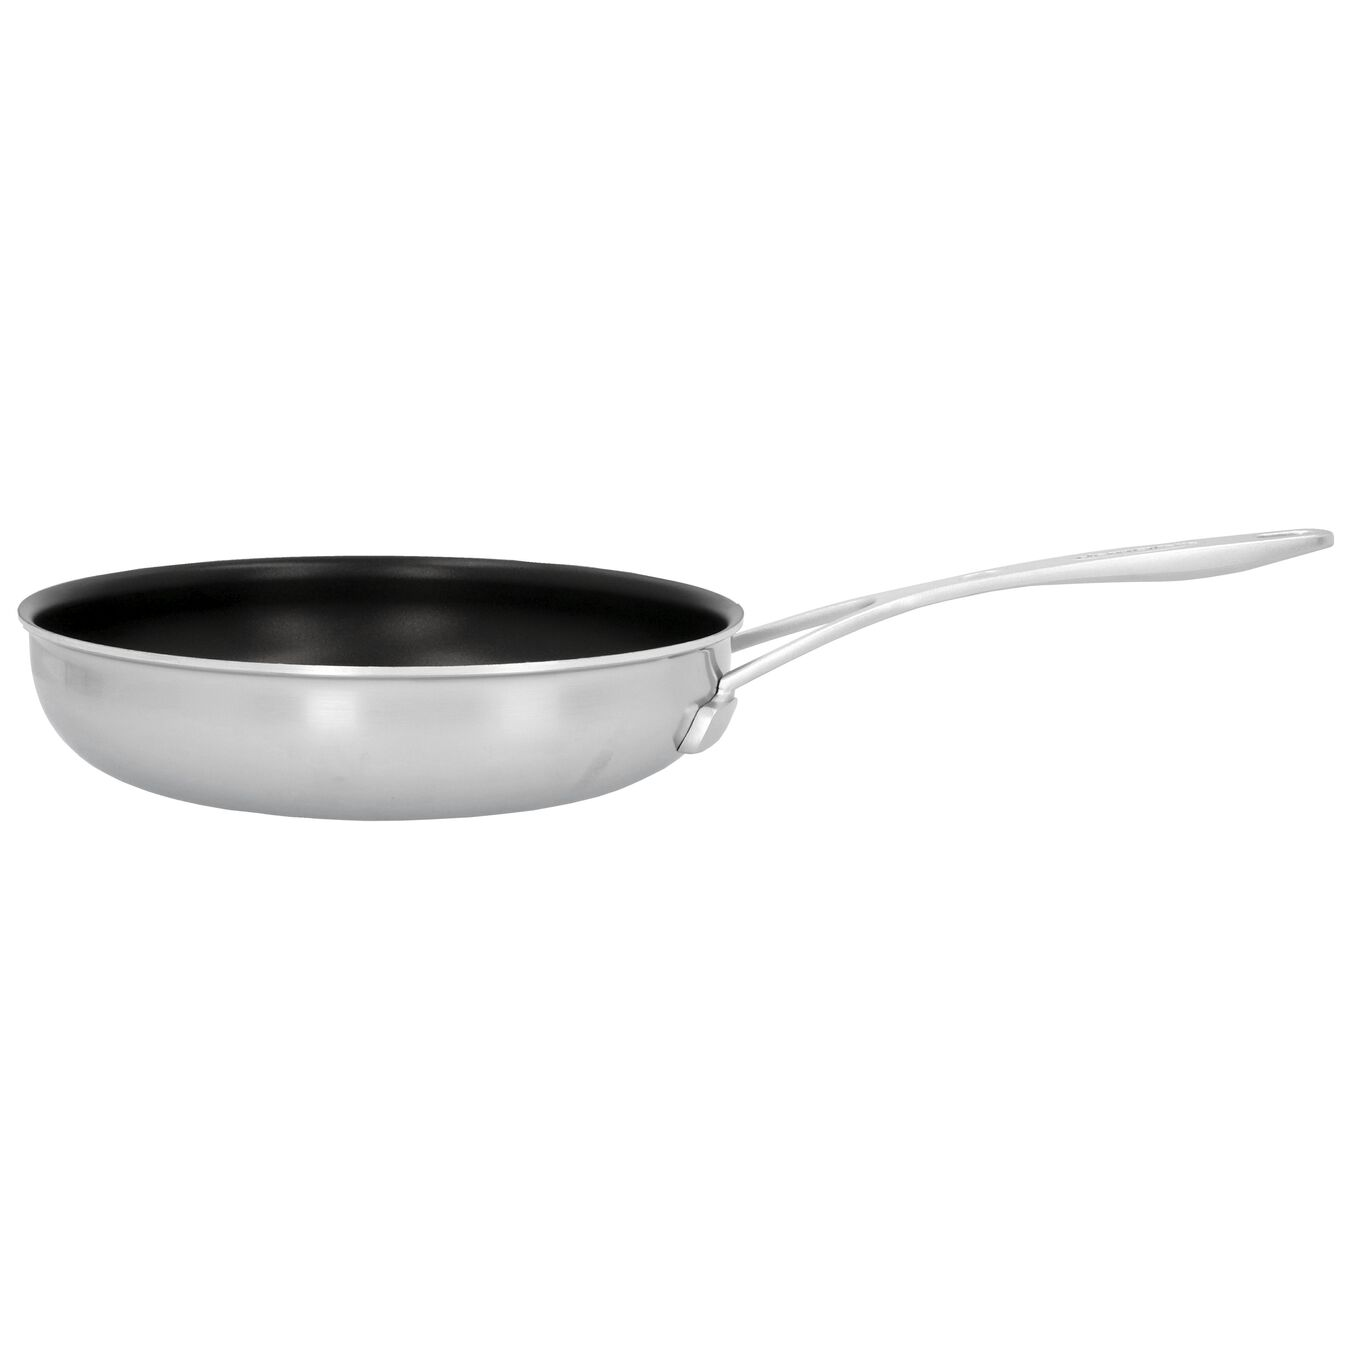 Stekpanna 24 cm, 18/10 Rostfritt stål, Silver-Svart,,large 1